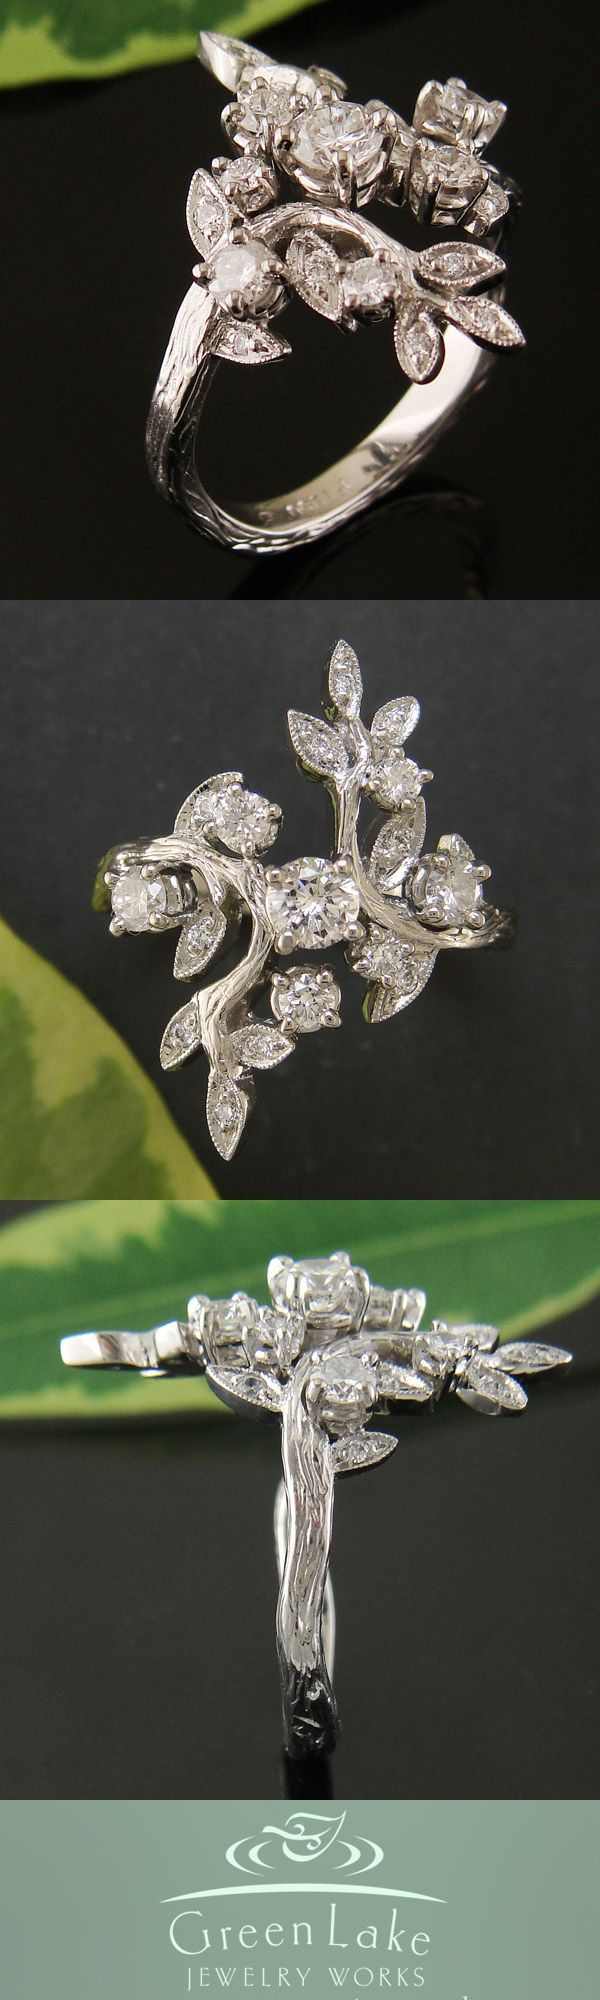 Ooh Gorgeous Wedding Ring Design